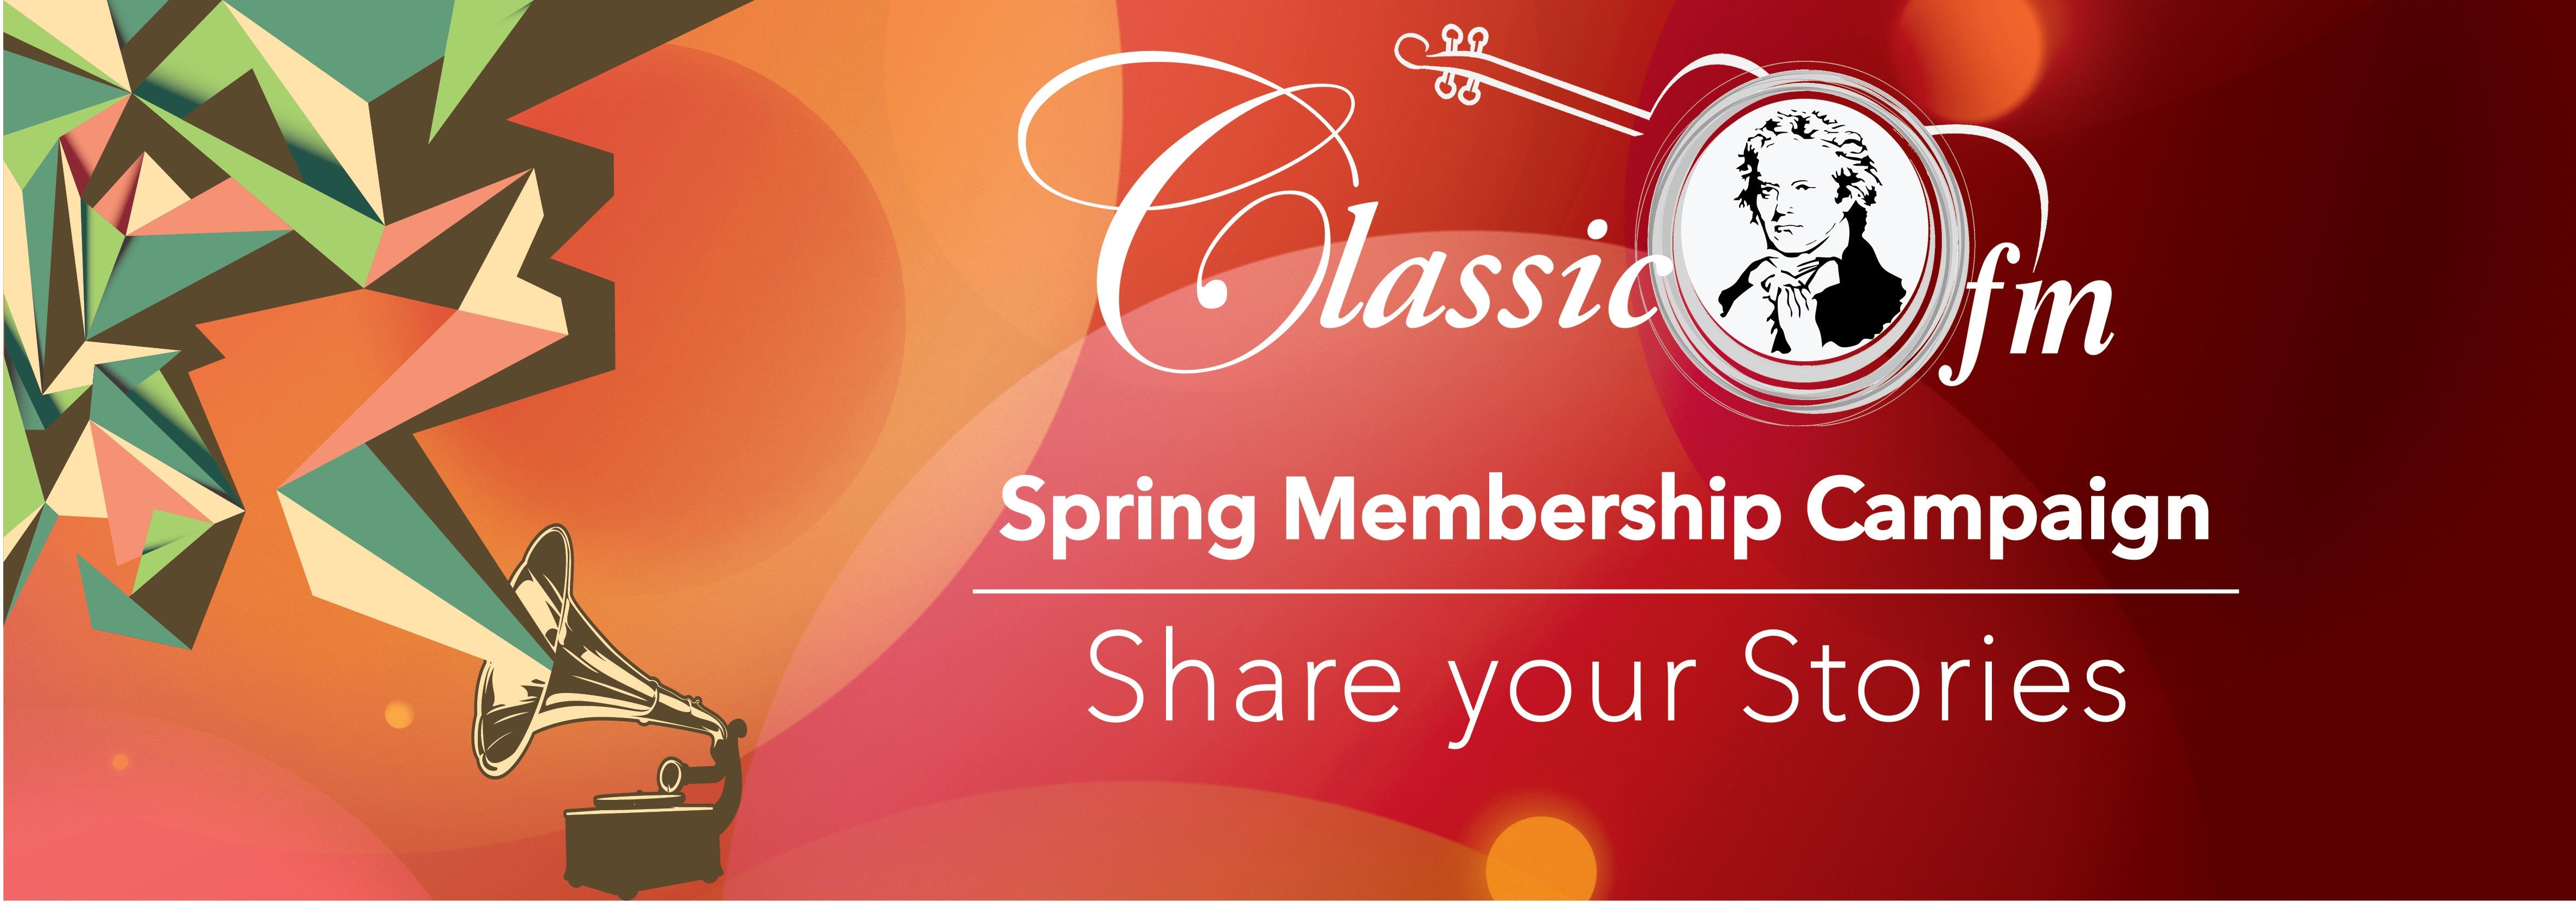 Classic FM spring Membership 2017 slider_stories